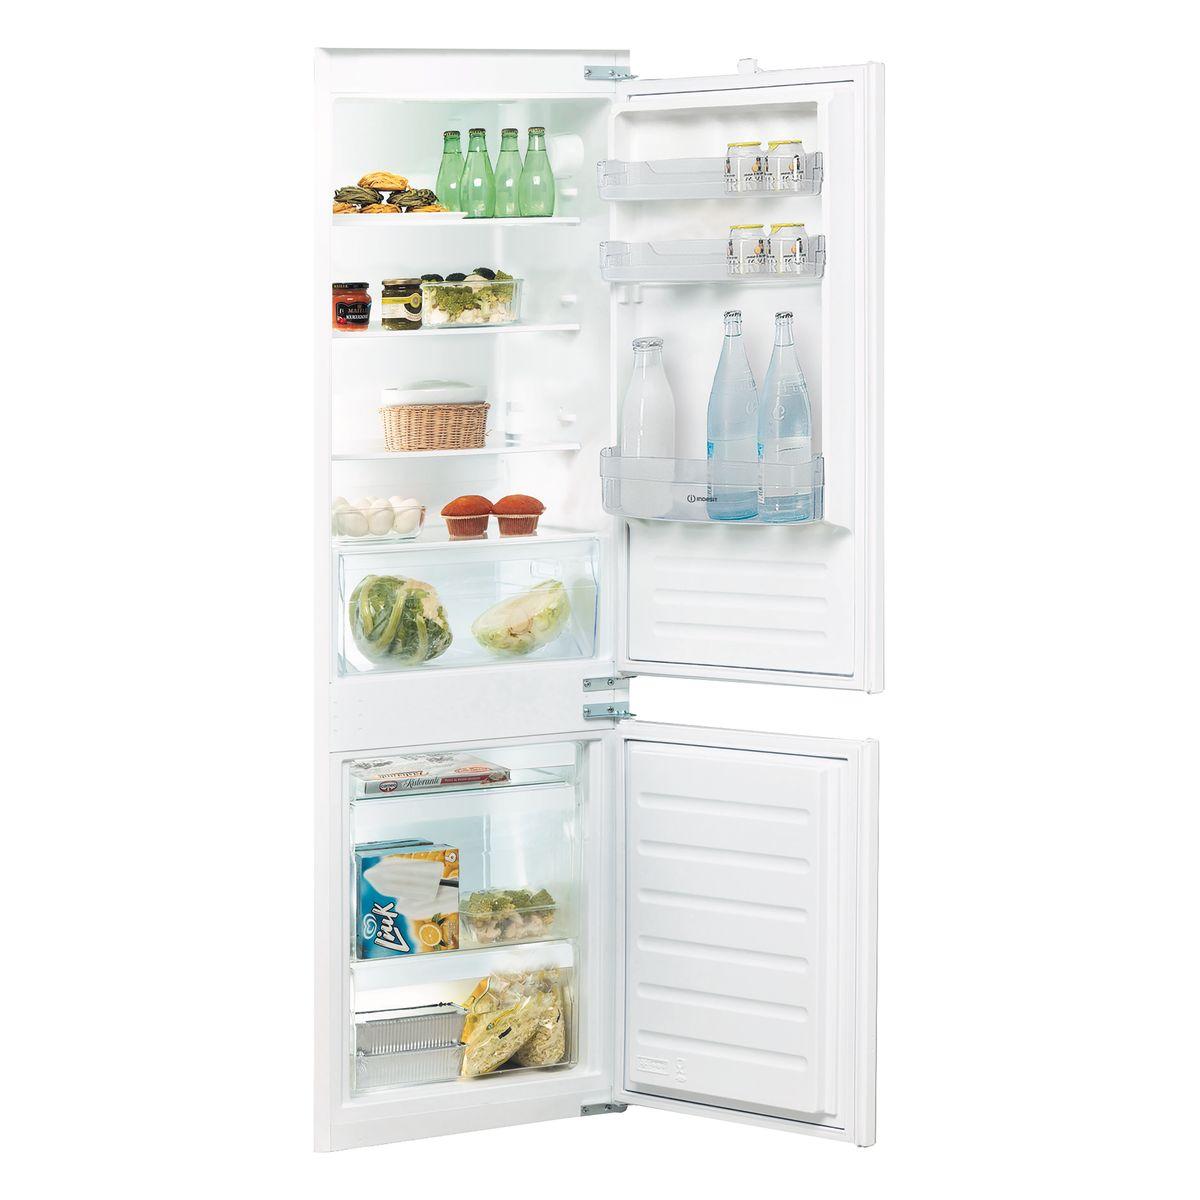 Frigoriferi bassi awesome frigoriferi samsung doppia porta with frigoriferi bassi best - Frigoriferi da incasso ikea ...